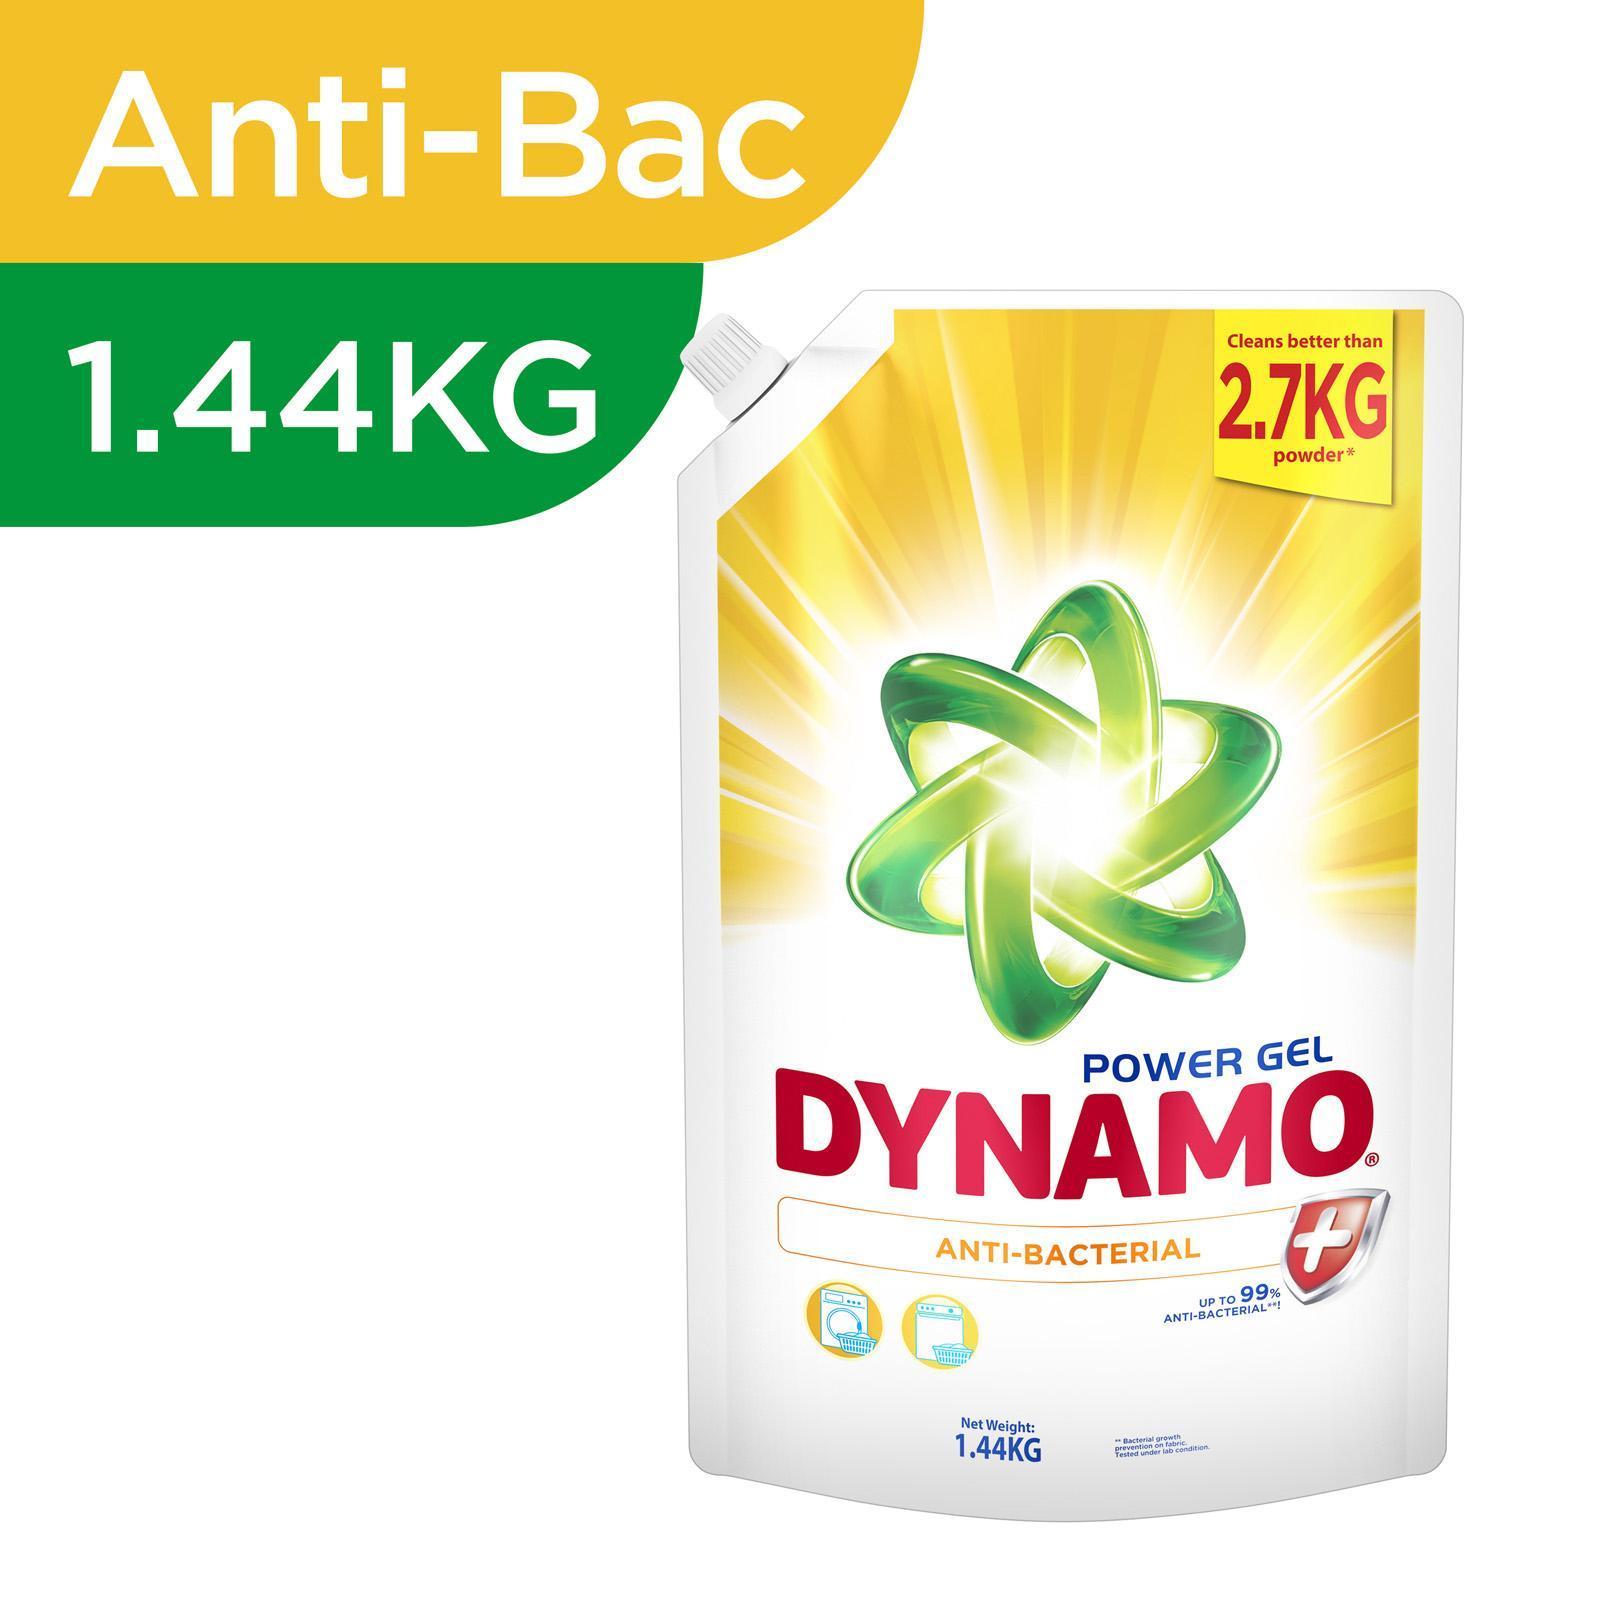 Dynamo Power Gel Anti-Bacterial Laundry Detergent Refill